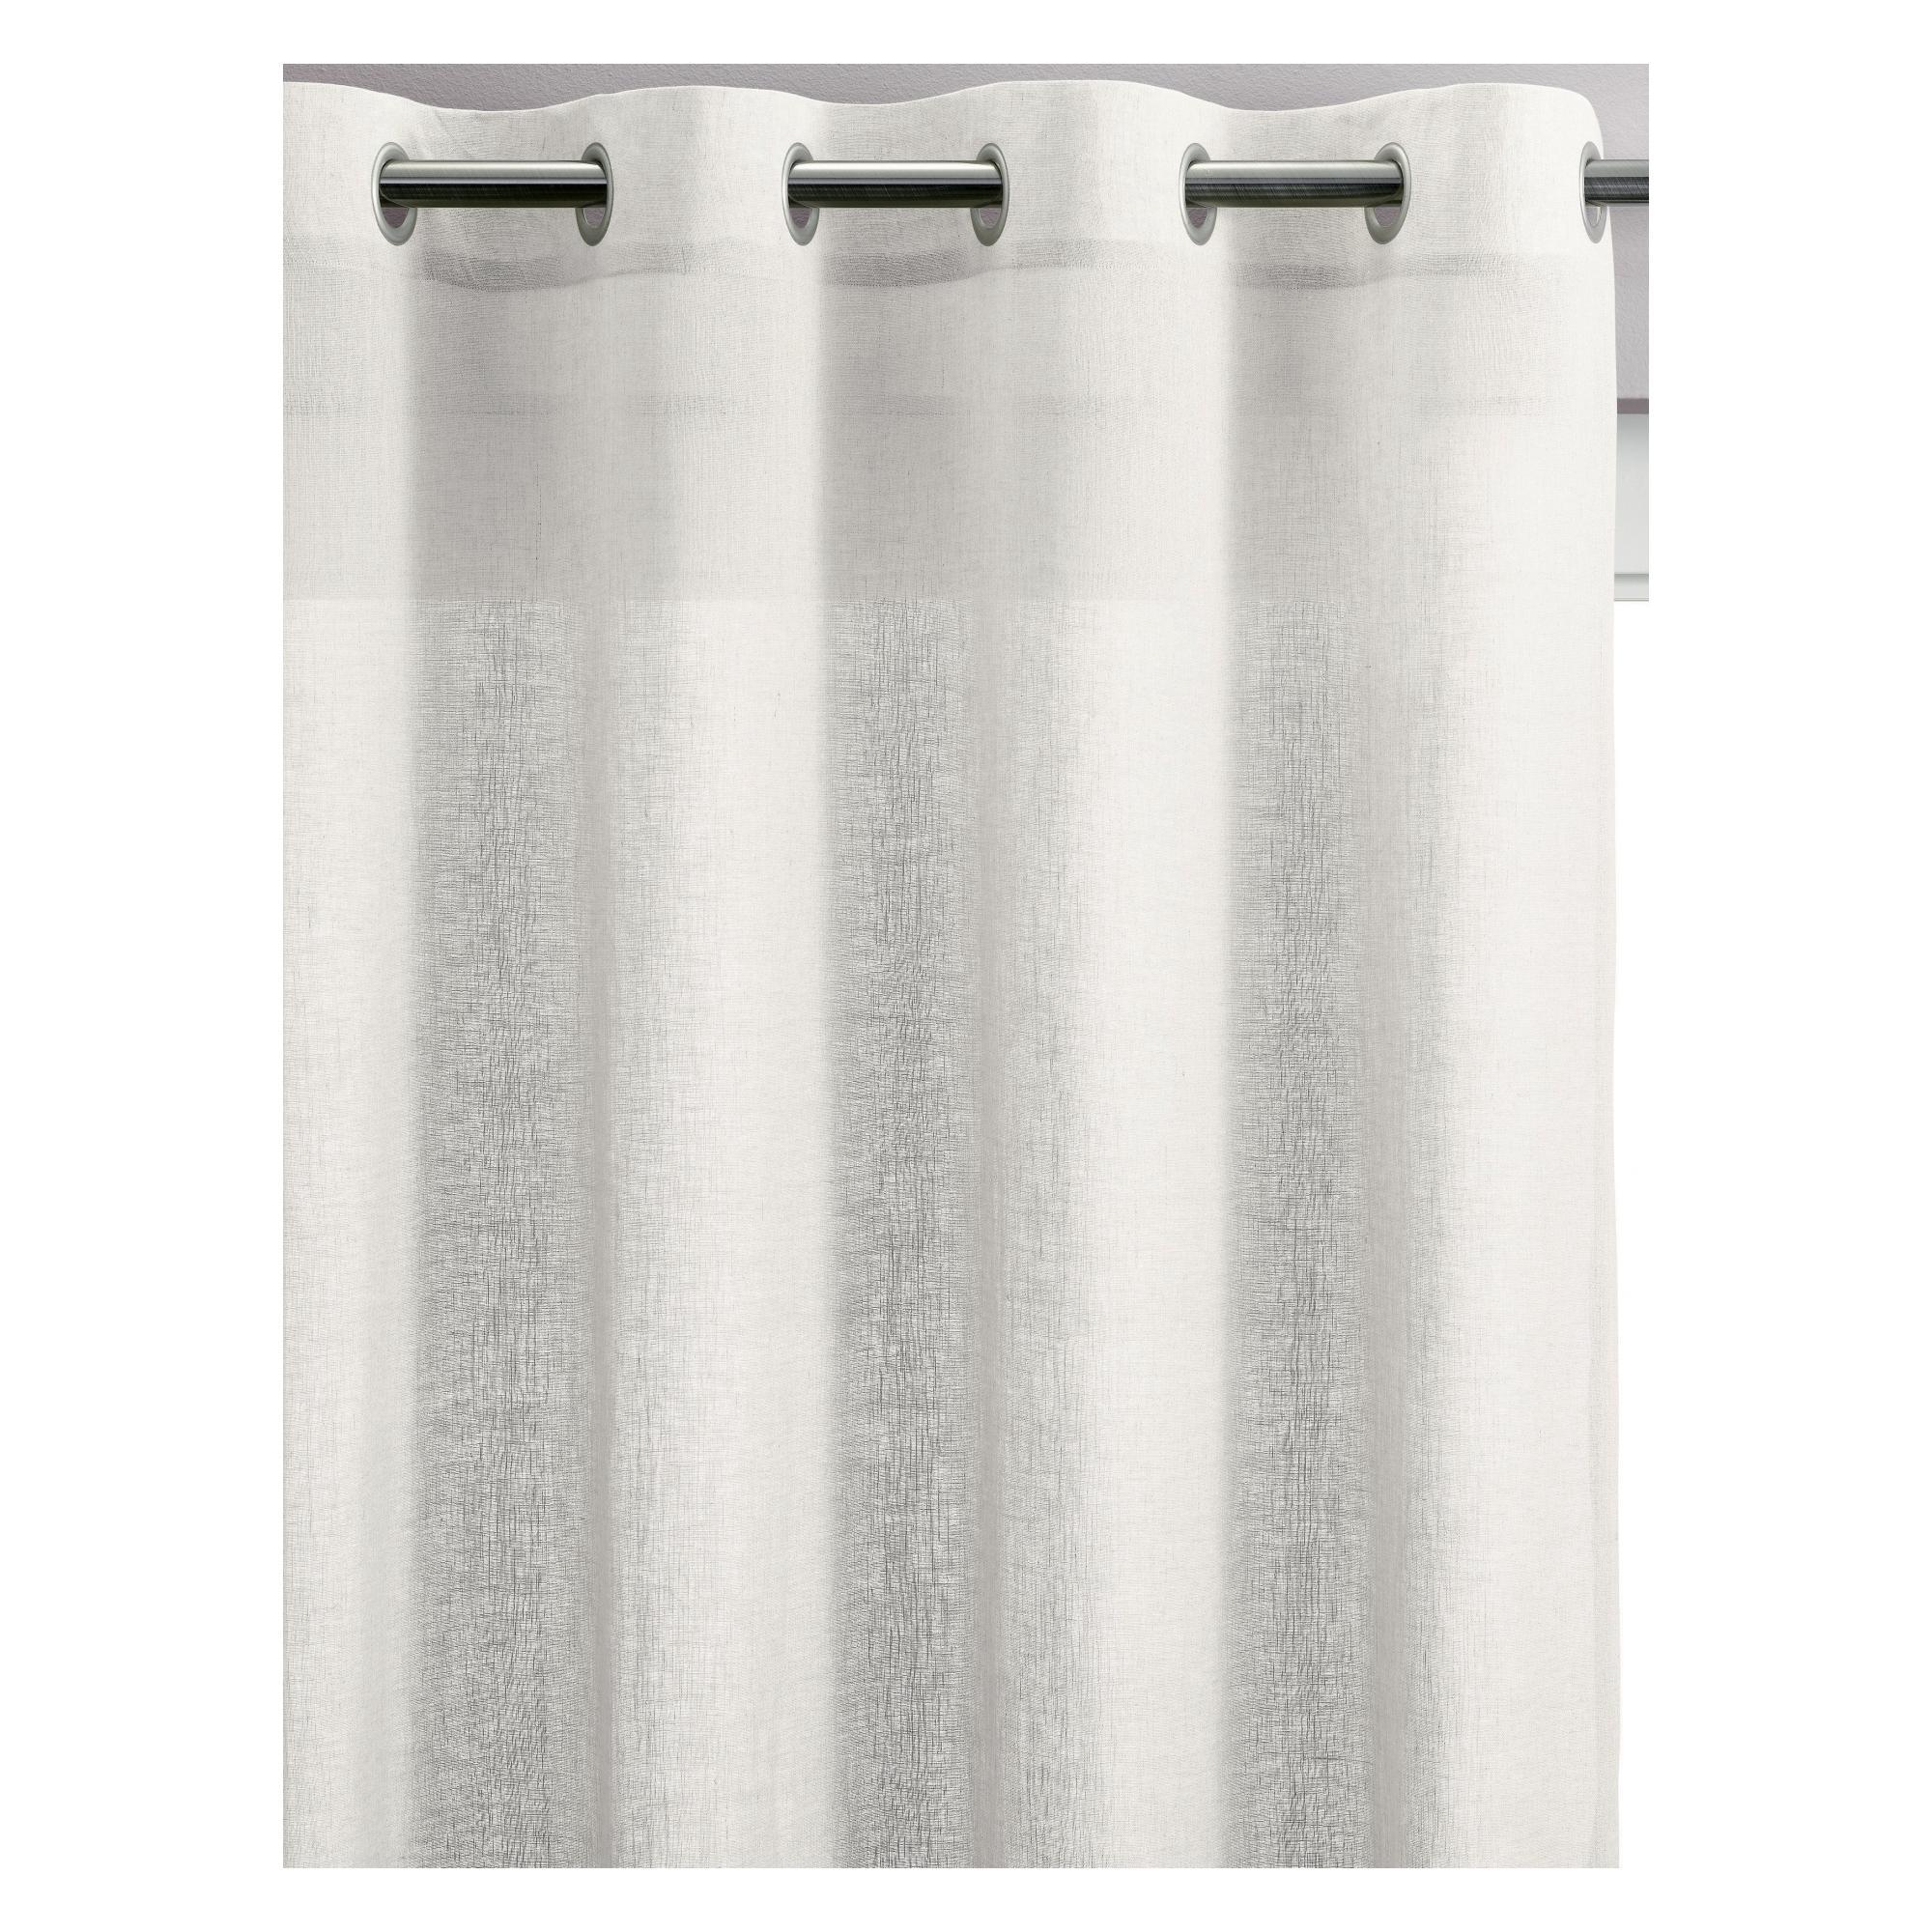 Rideau Voile en lin blanc 140 x 280